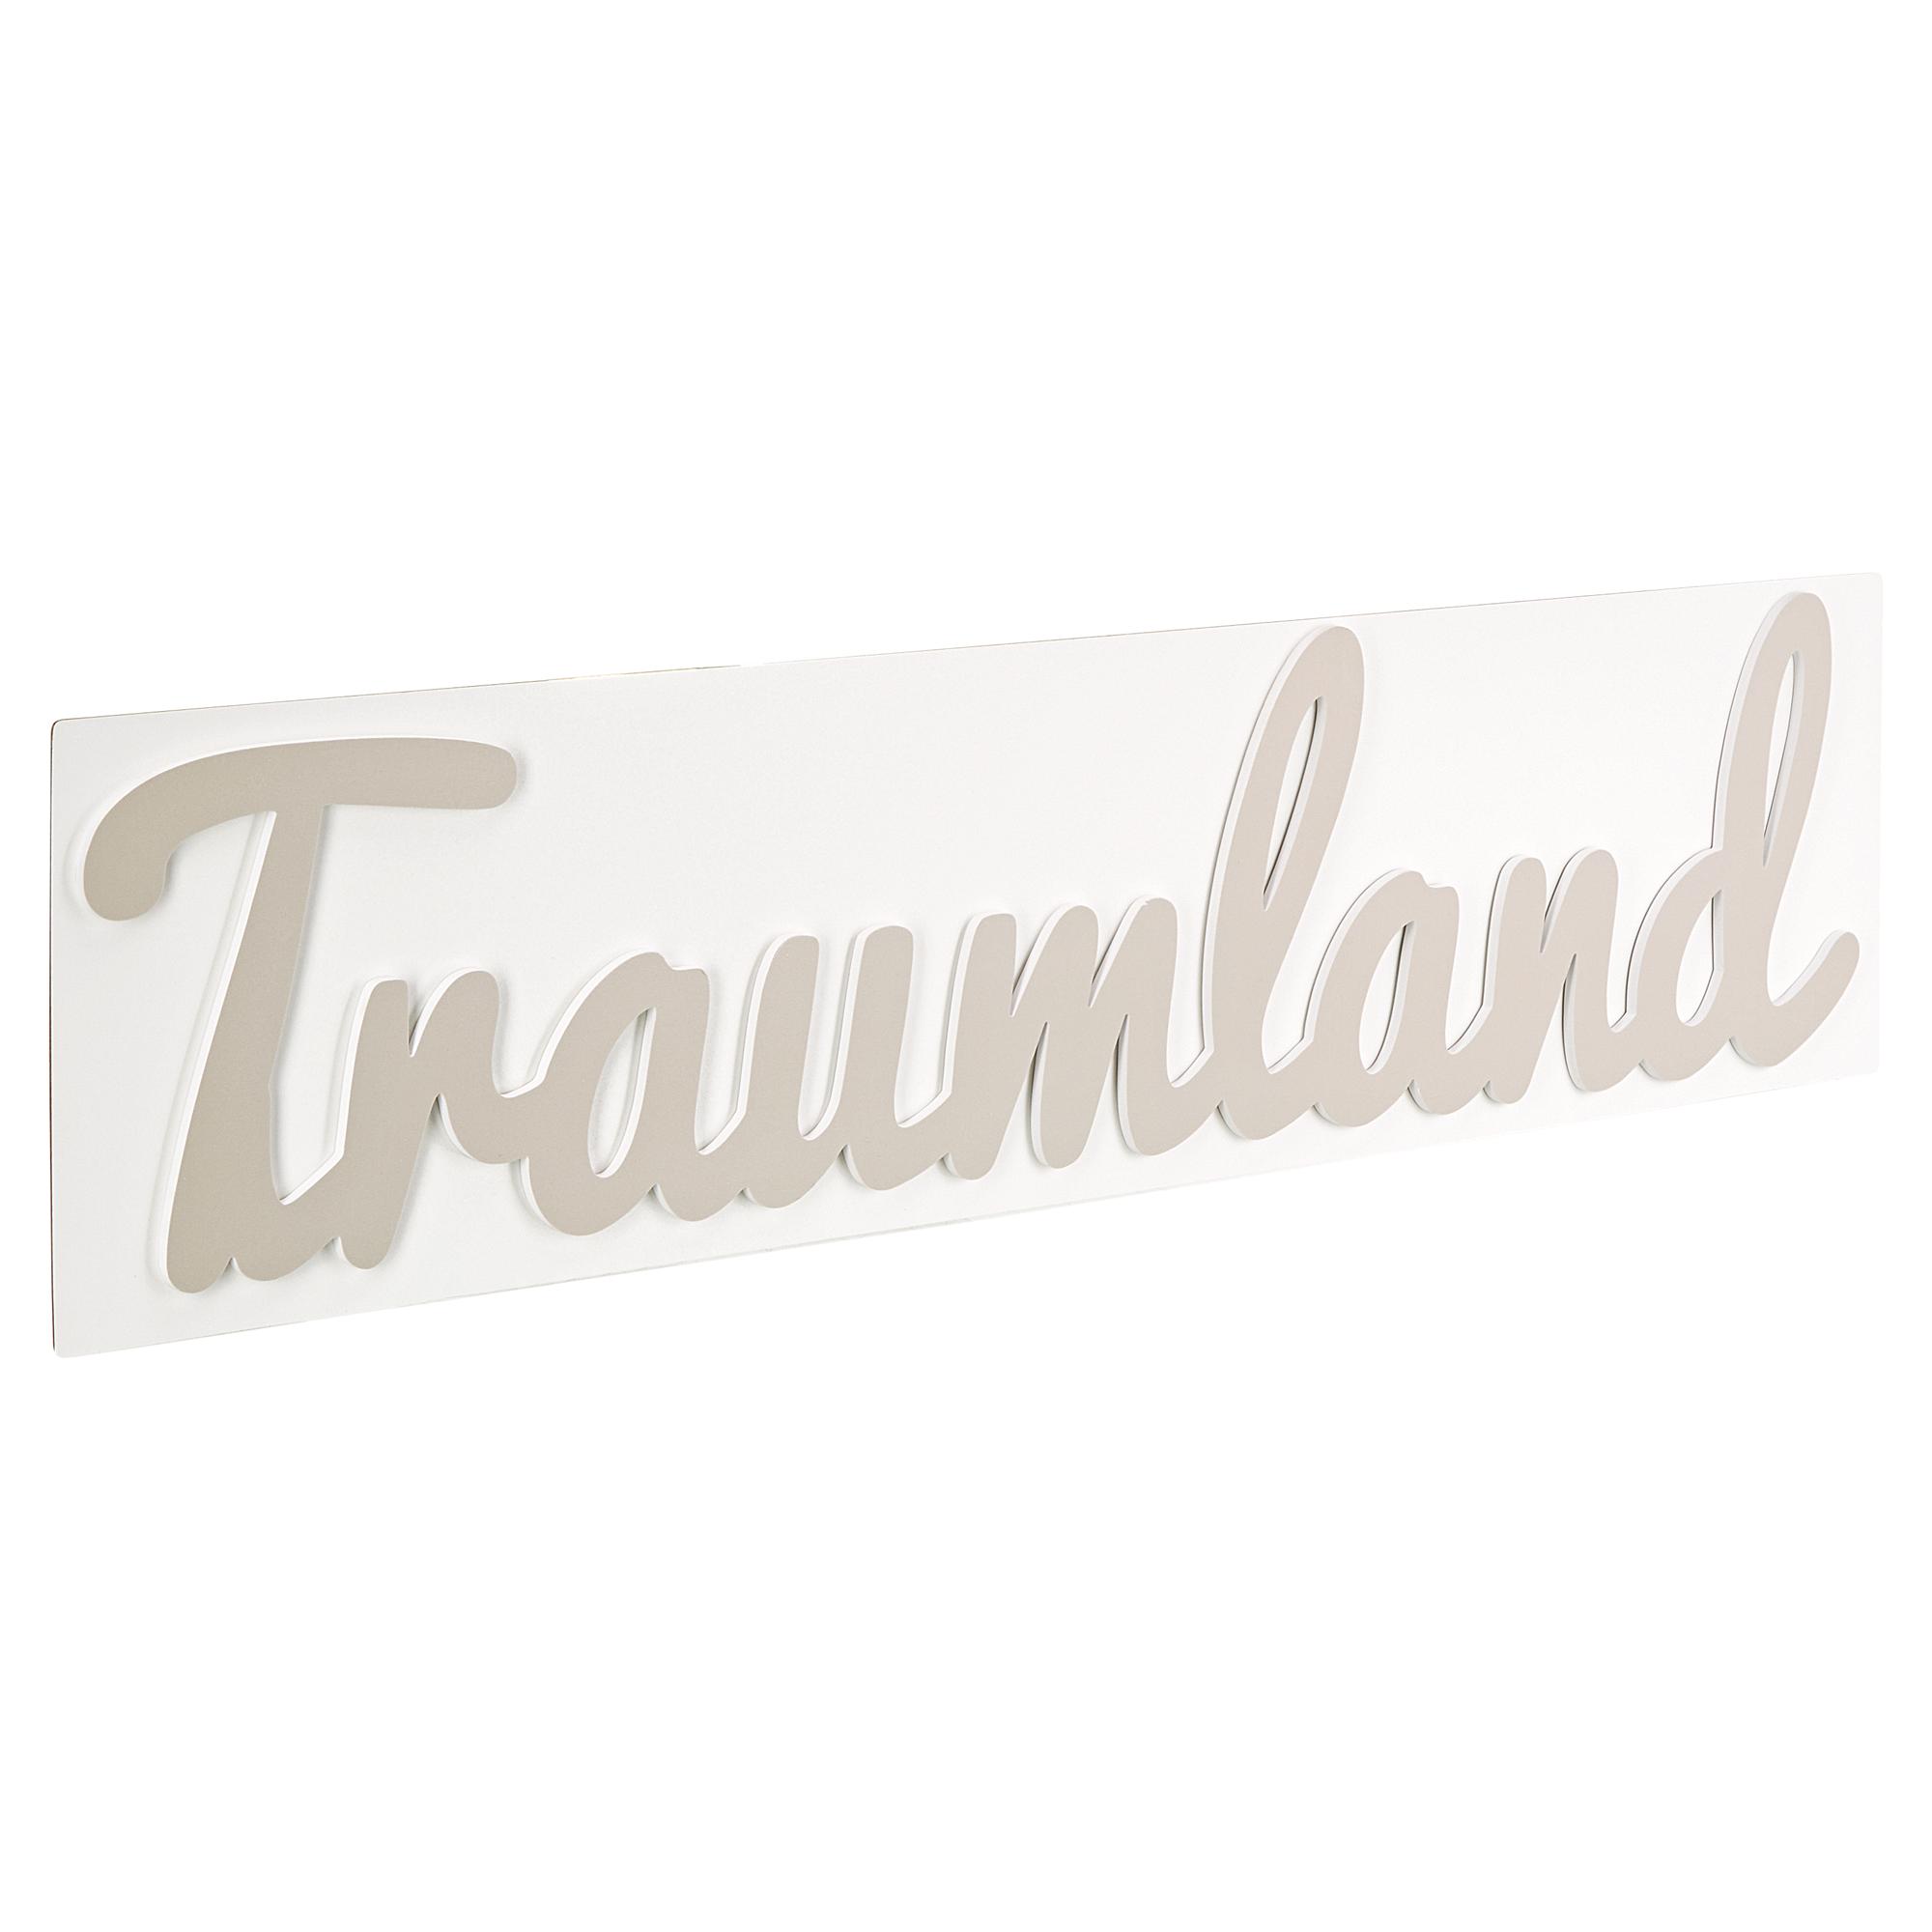 Pro Art Dekoschriftzug Traumland 120 X 30 Cm ǀ Toom Baumarkt